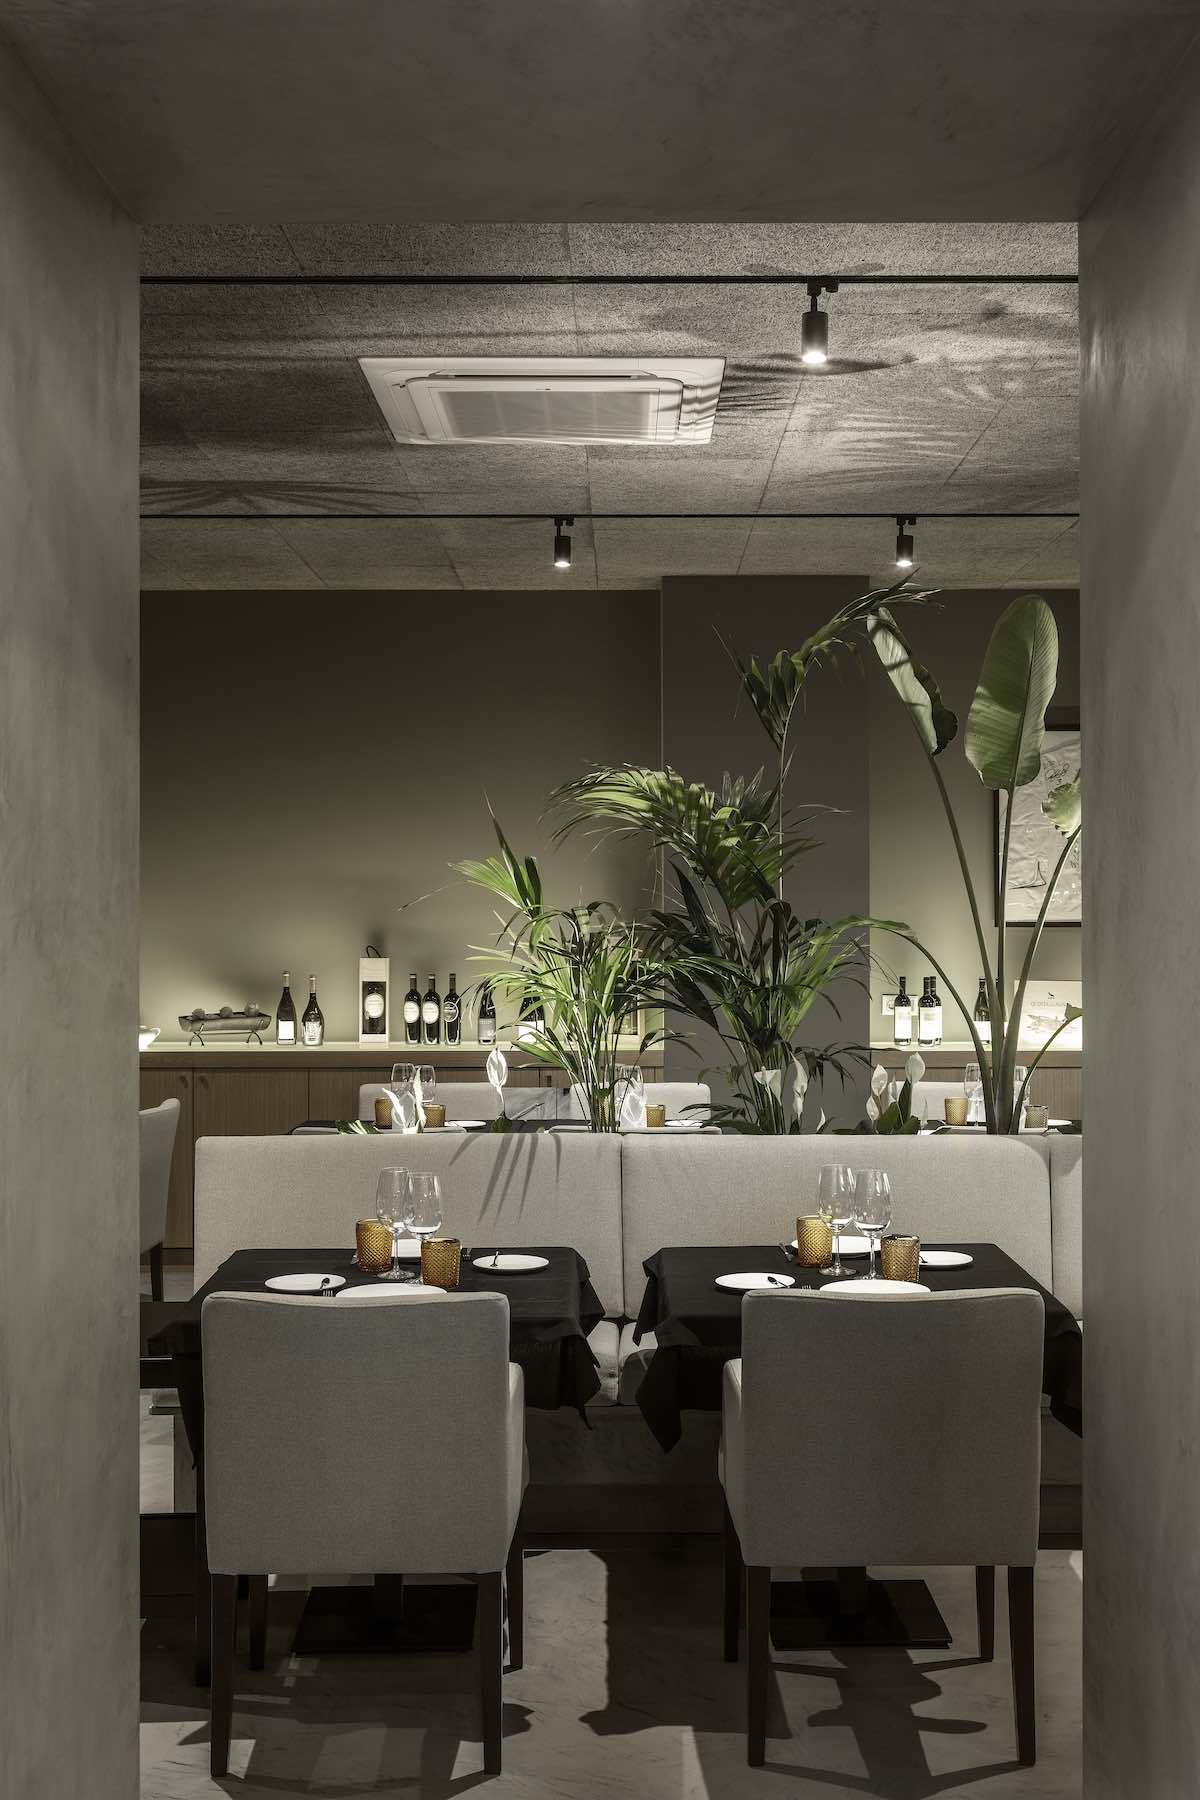 FAMA_Restaurant_Paulo_Martins_Arquitectura_and_design_AmazingArchitecture_%20014.jpg